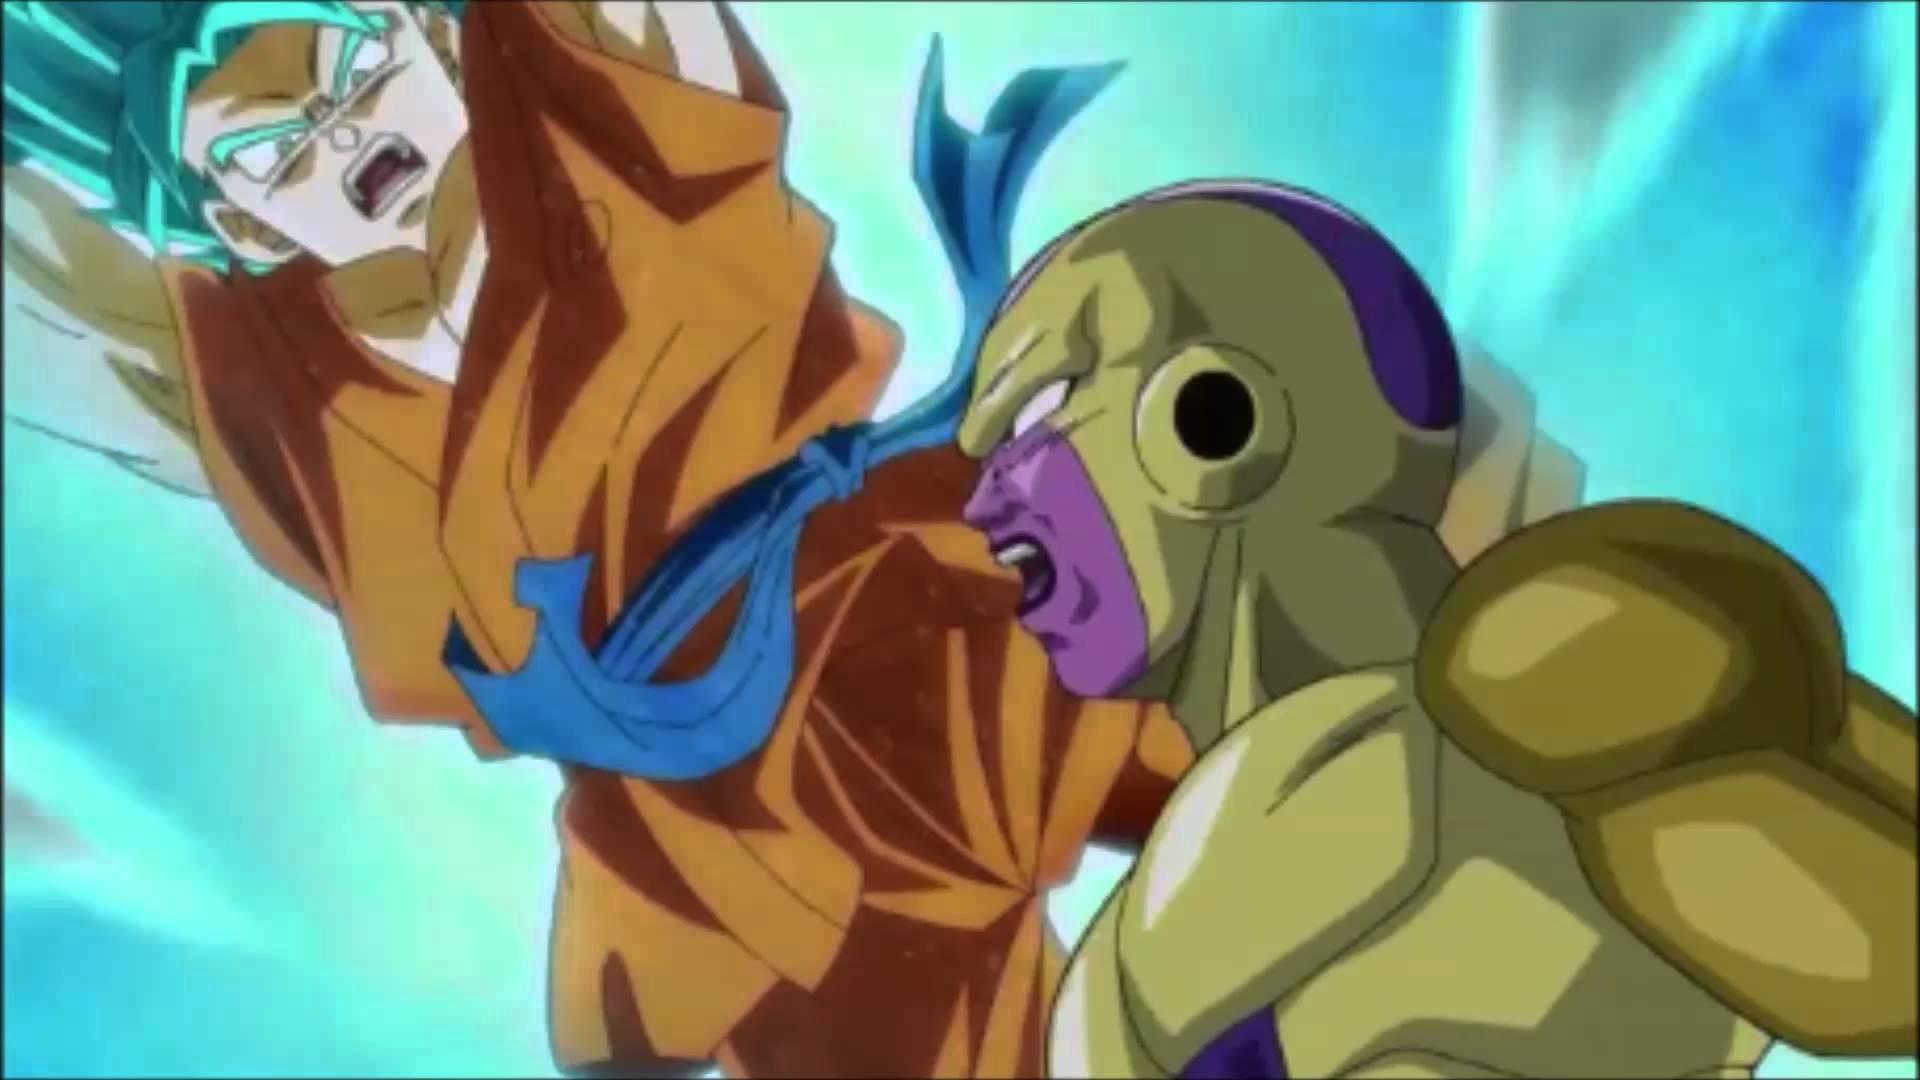 Dragon Ball Z Ressurrection F FOOTAGE – SS God SS Goku vs. Golden Frieza  IMAX 3D HD TV SPOT CLIP!